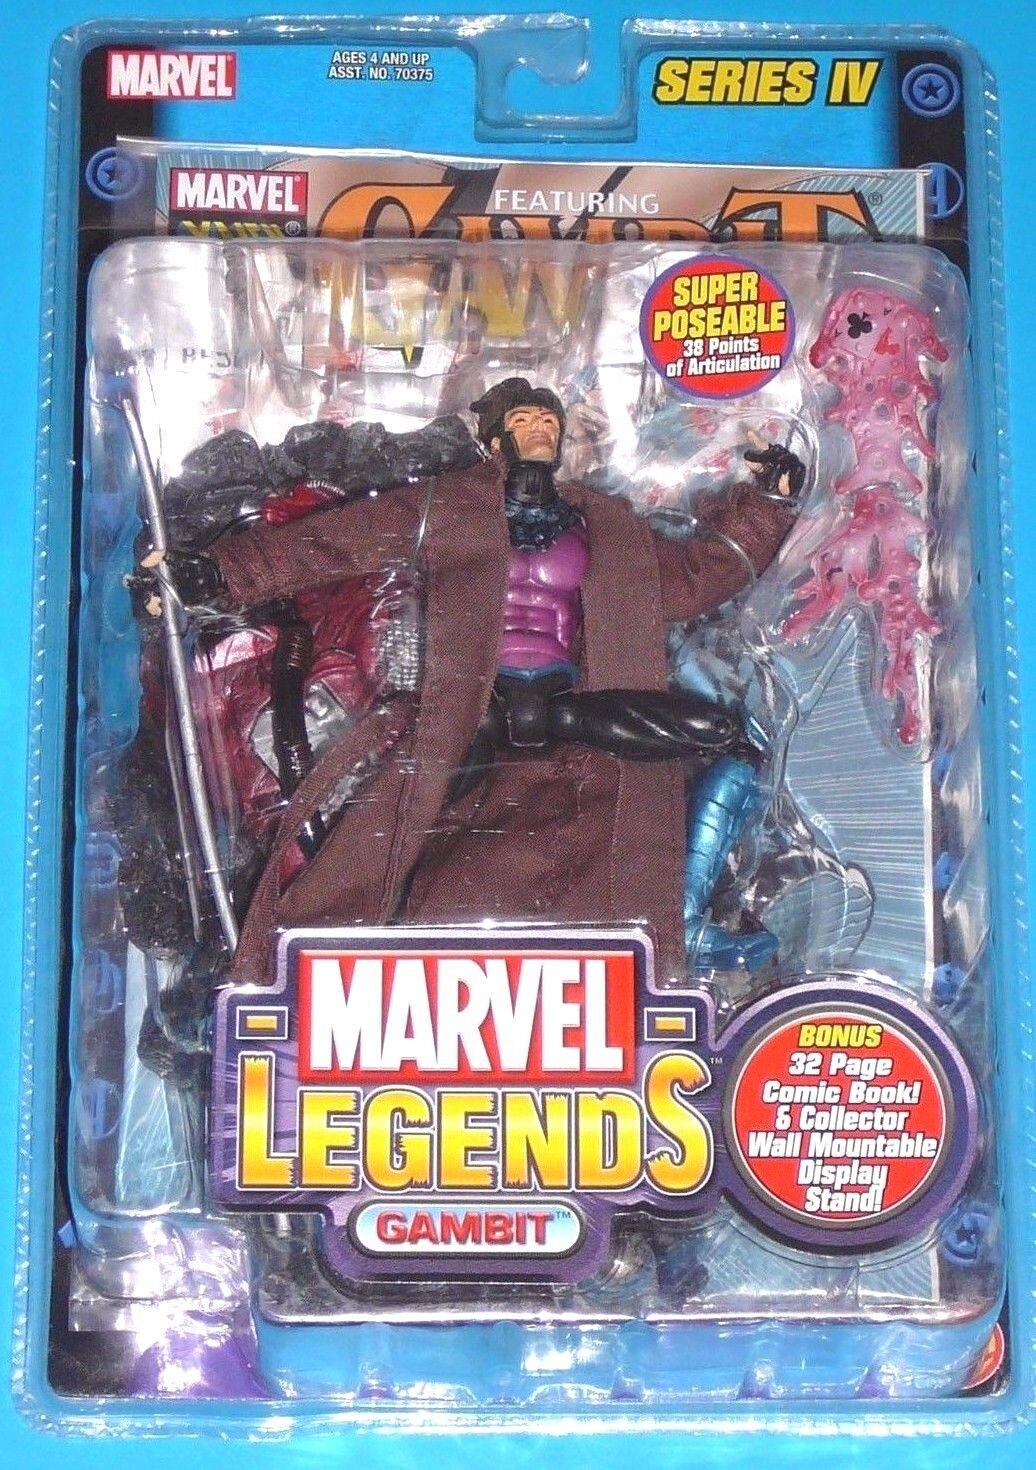 Marvel - legenden gambit serie iv (4) x - men neue 2003 toybiz gambit unheimlich, x - men -